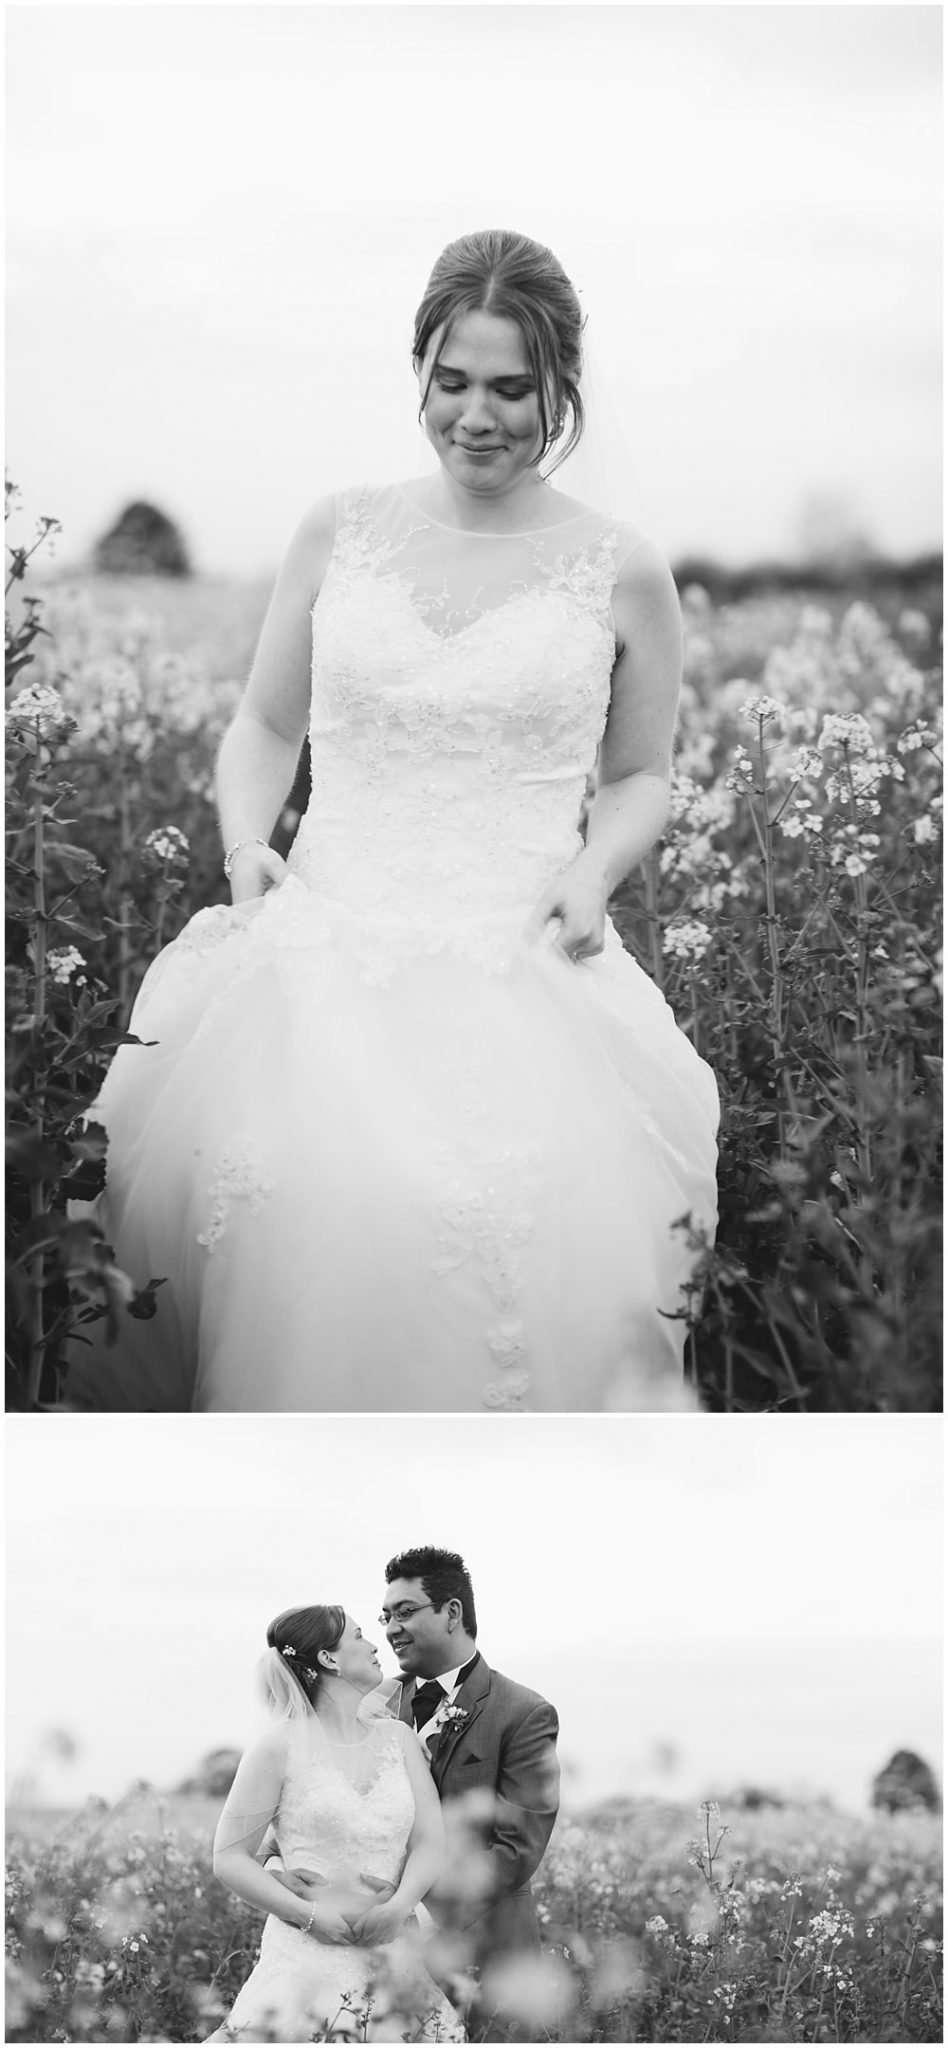 CHLOE AND JAIMIN RED BARN WEDDING - NORFOLK WEDDING PHOTOGRAPHER 3